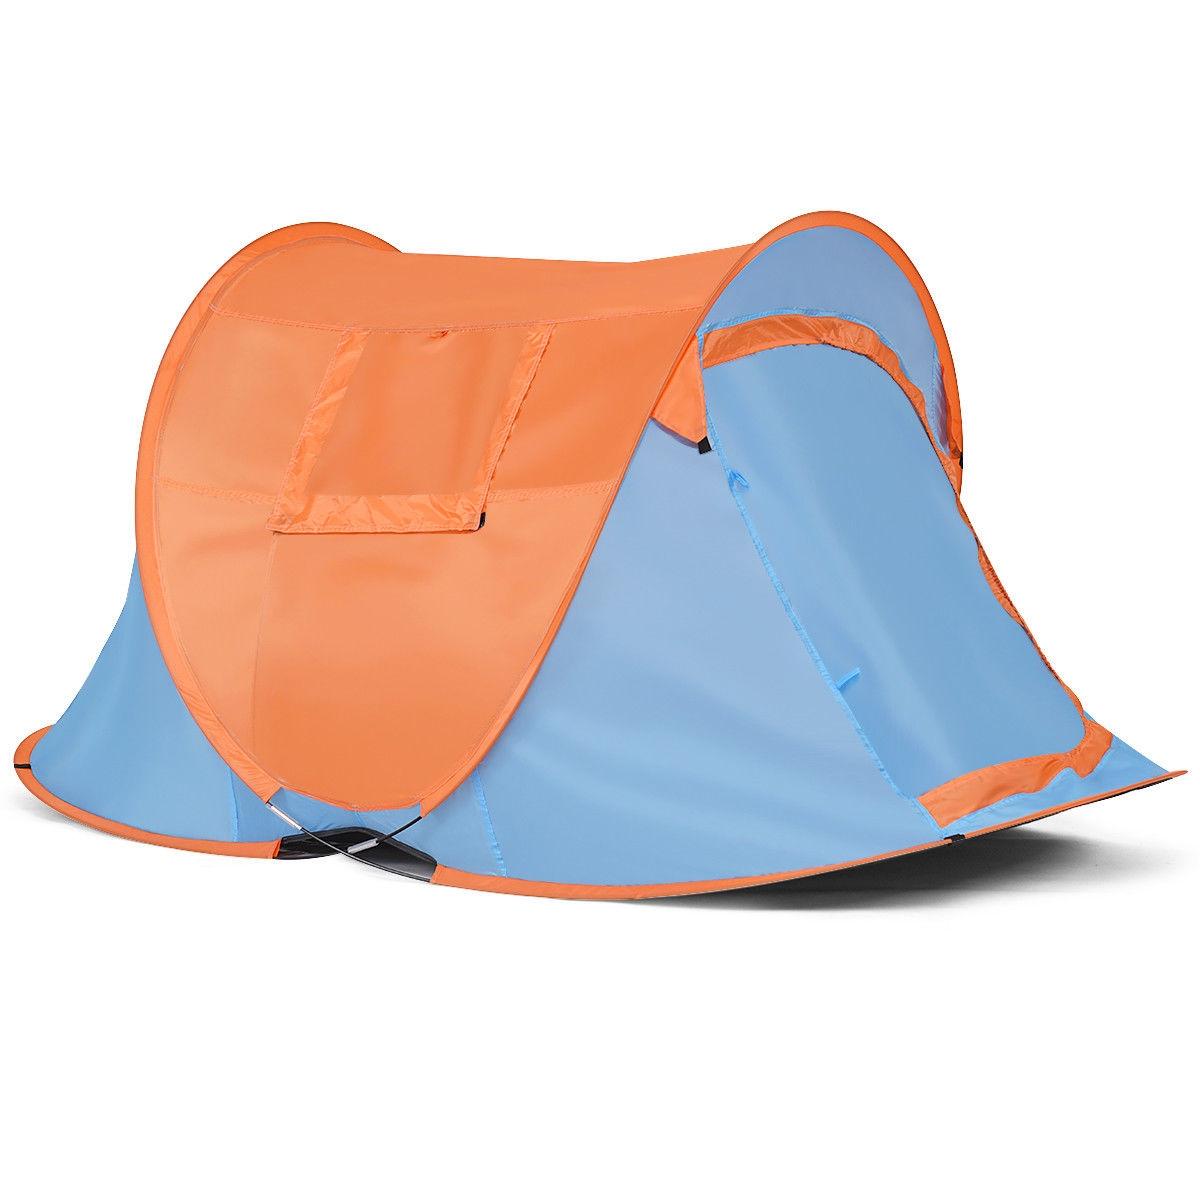 Portable Water Resistant Automatic Pop-up Tent-Blue & Orange